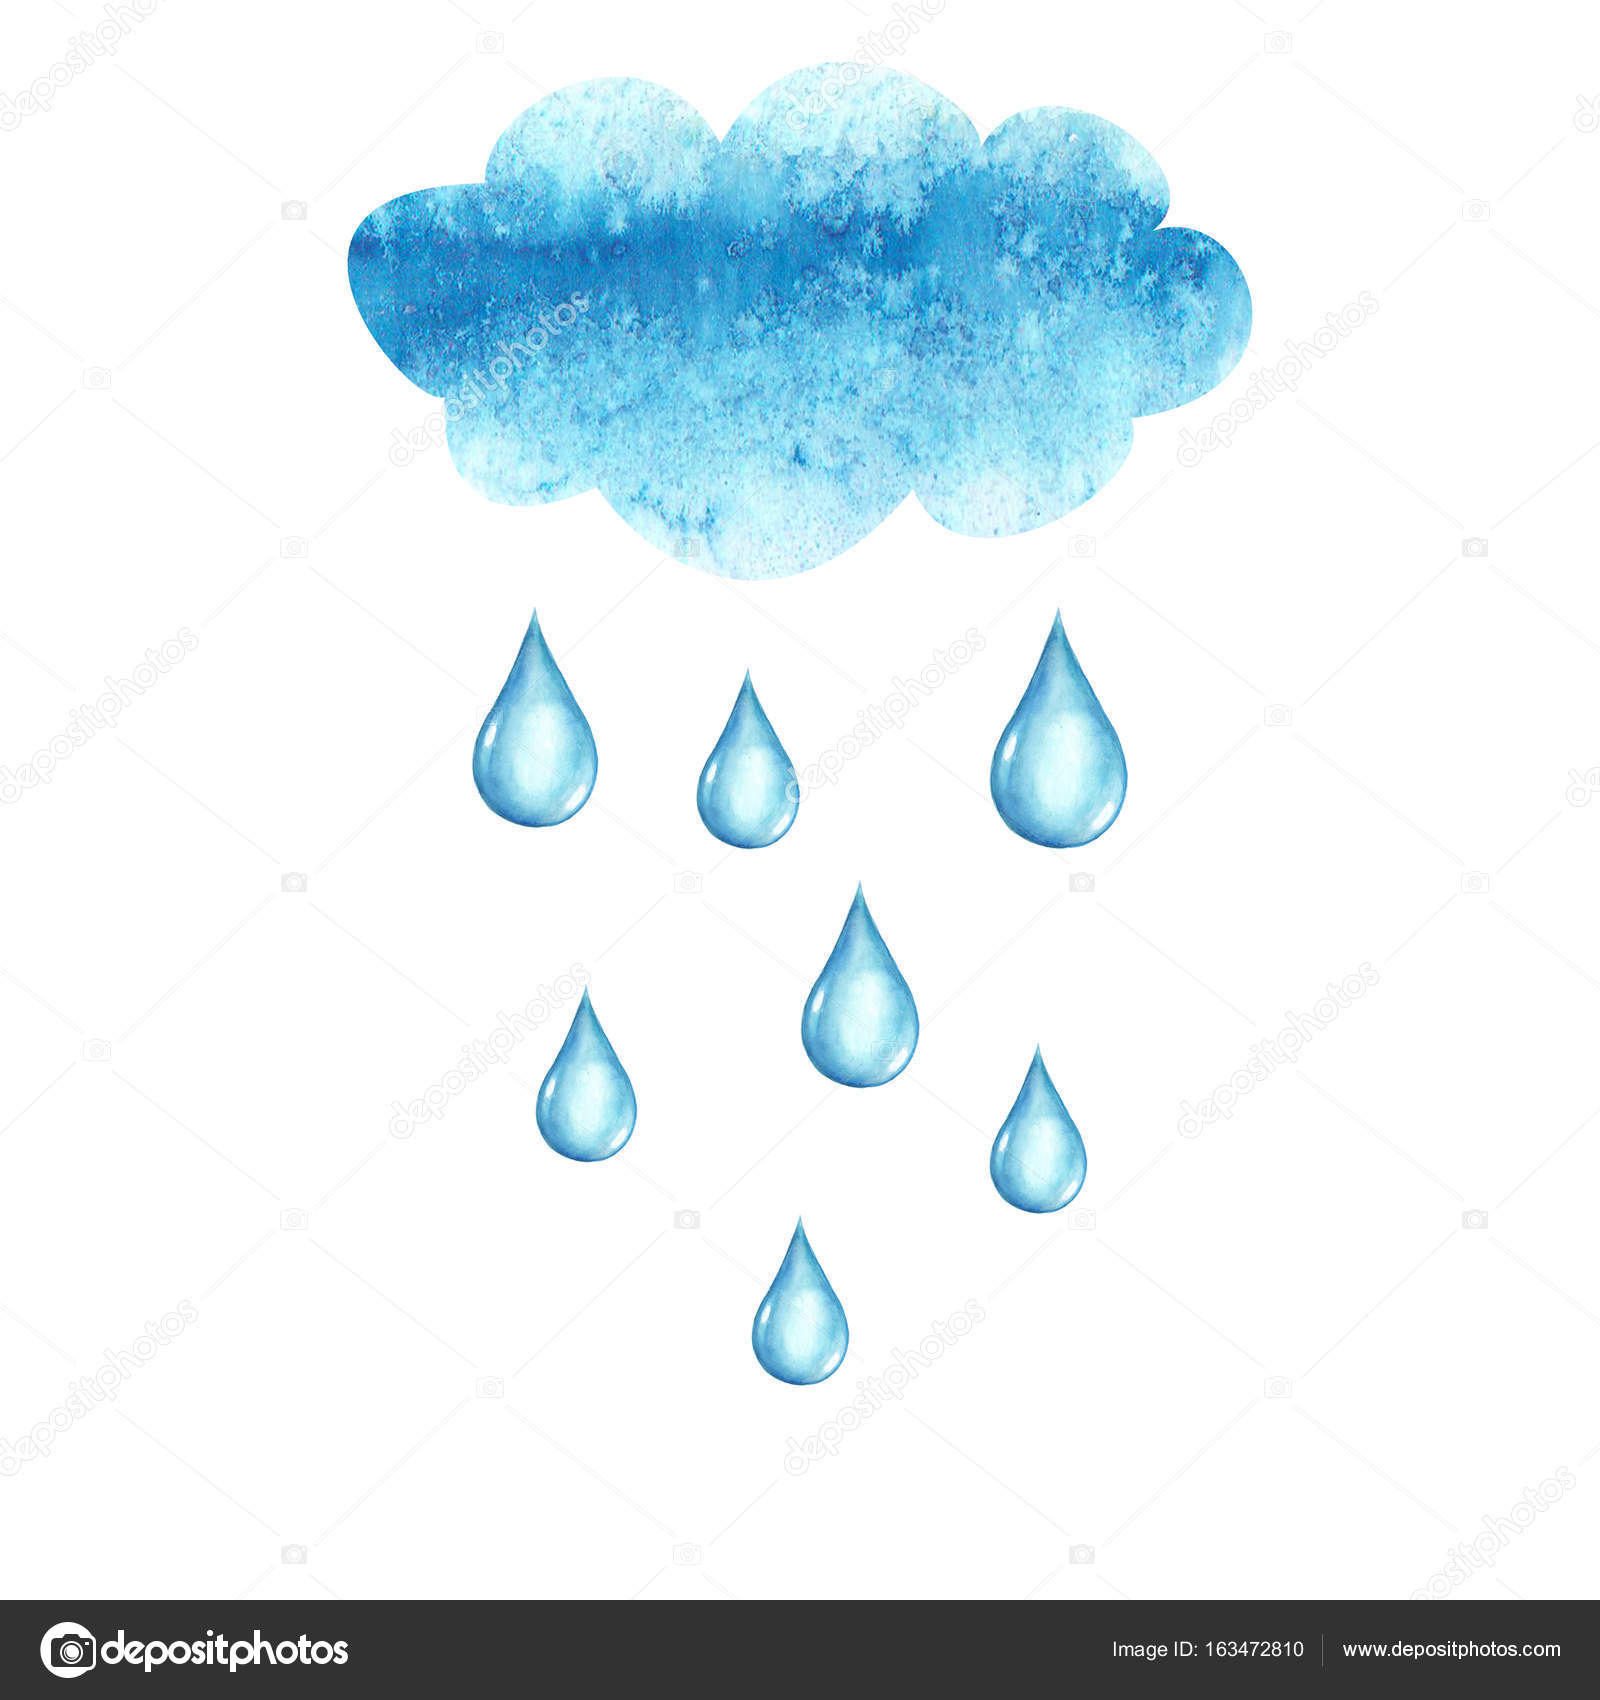 Watercolor Cloud And Rain Drops Stock Vector C Olgaze 163472810